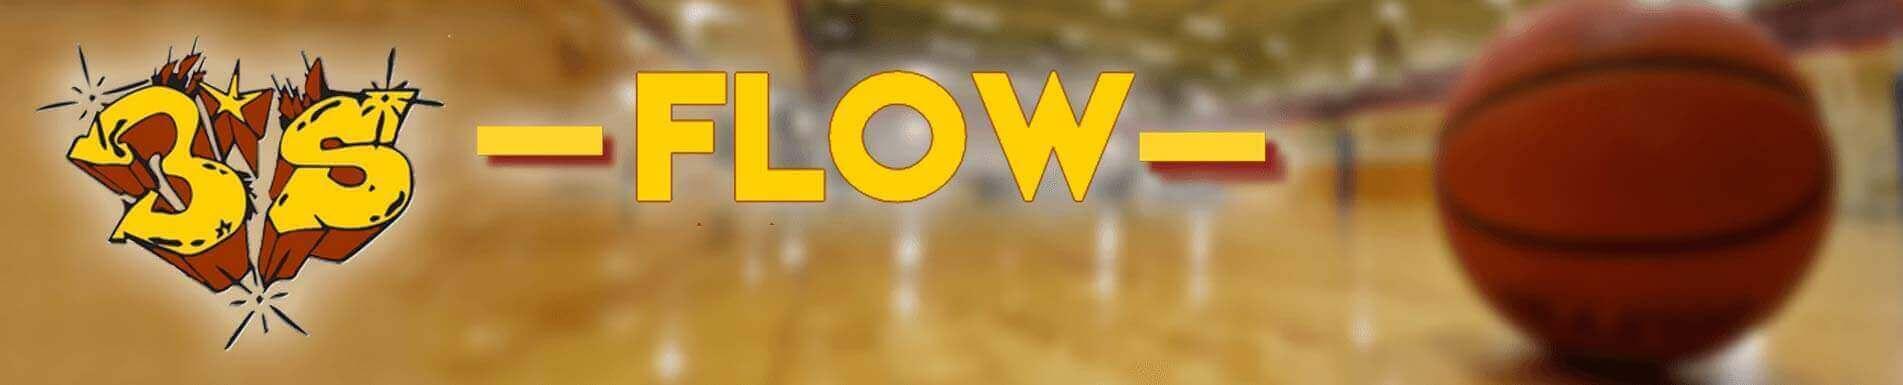 aromes 3's flow